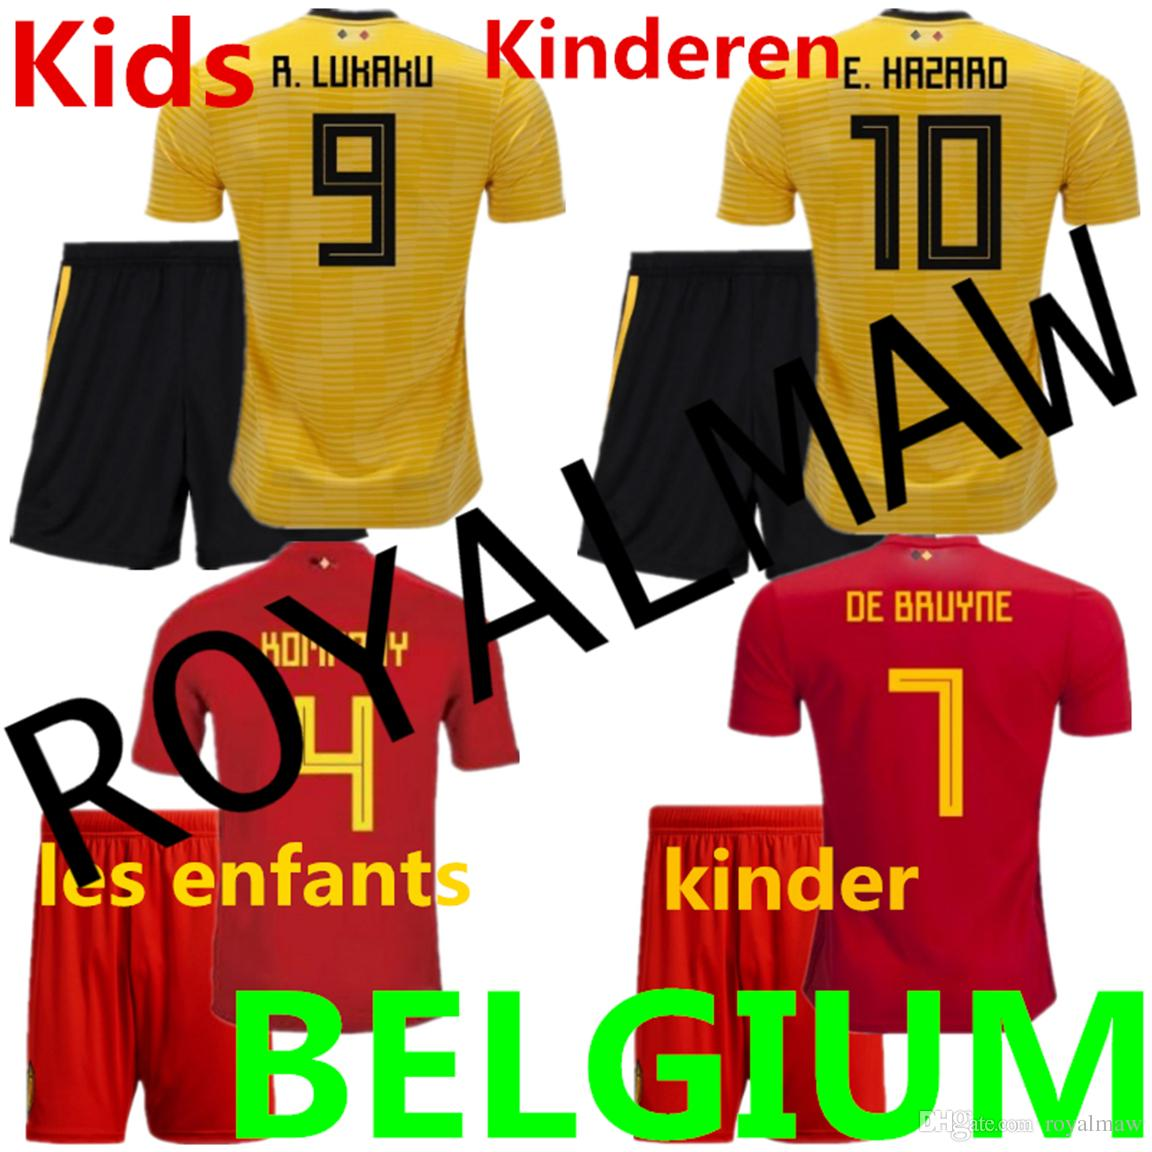 d25a4dce4e5 2019 Belgium Kids Jersey 2018 World Cup Belgique Enfant Maillot De Foot Home  Red Away Yellow Belgien Football Uniform Kit België Child Clothes From  Royalmaw ...